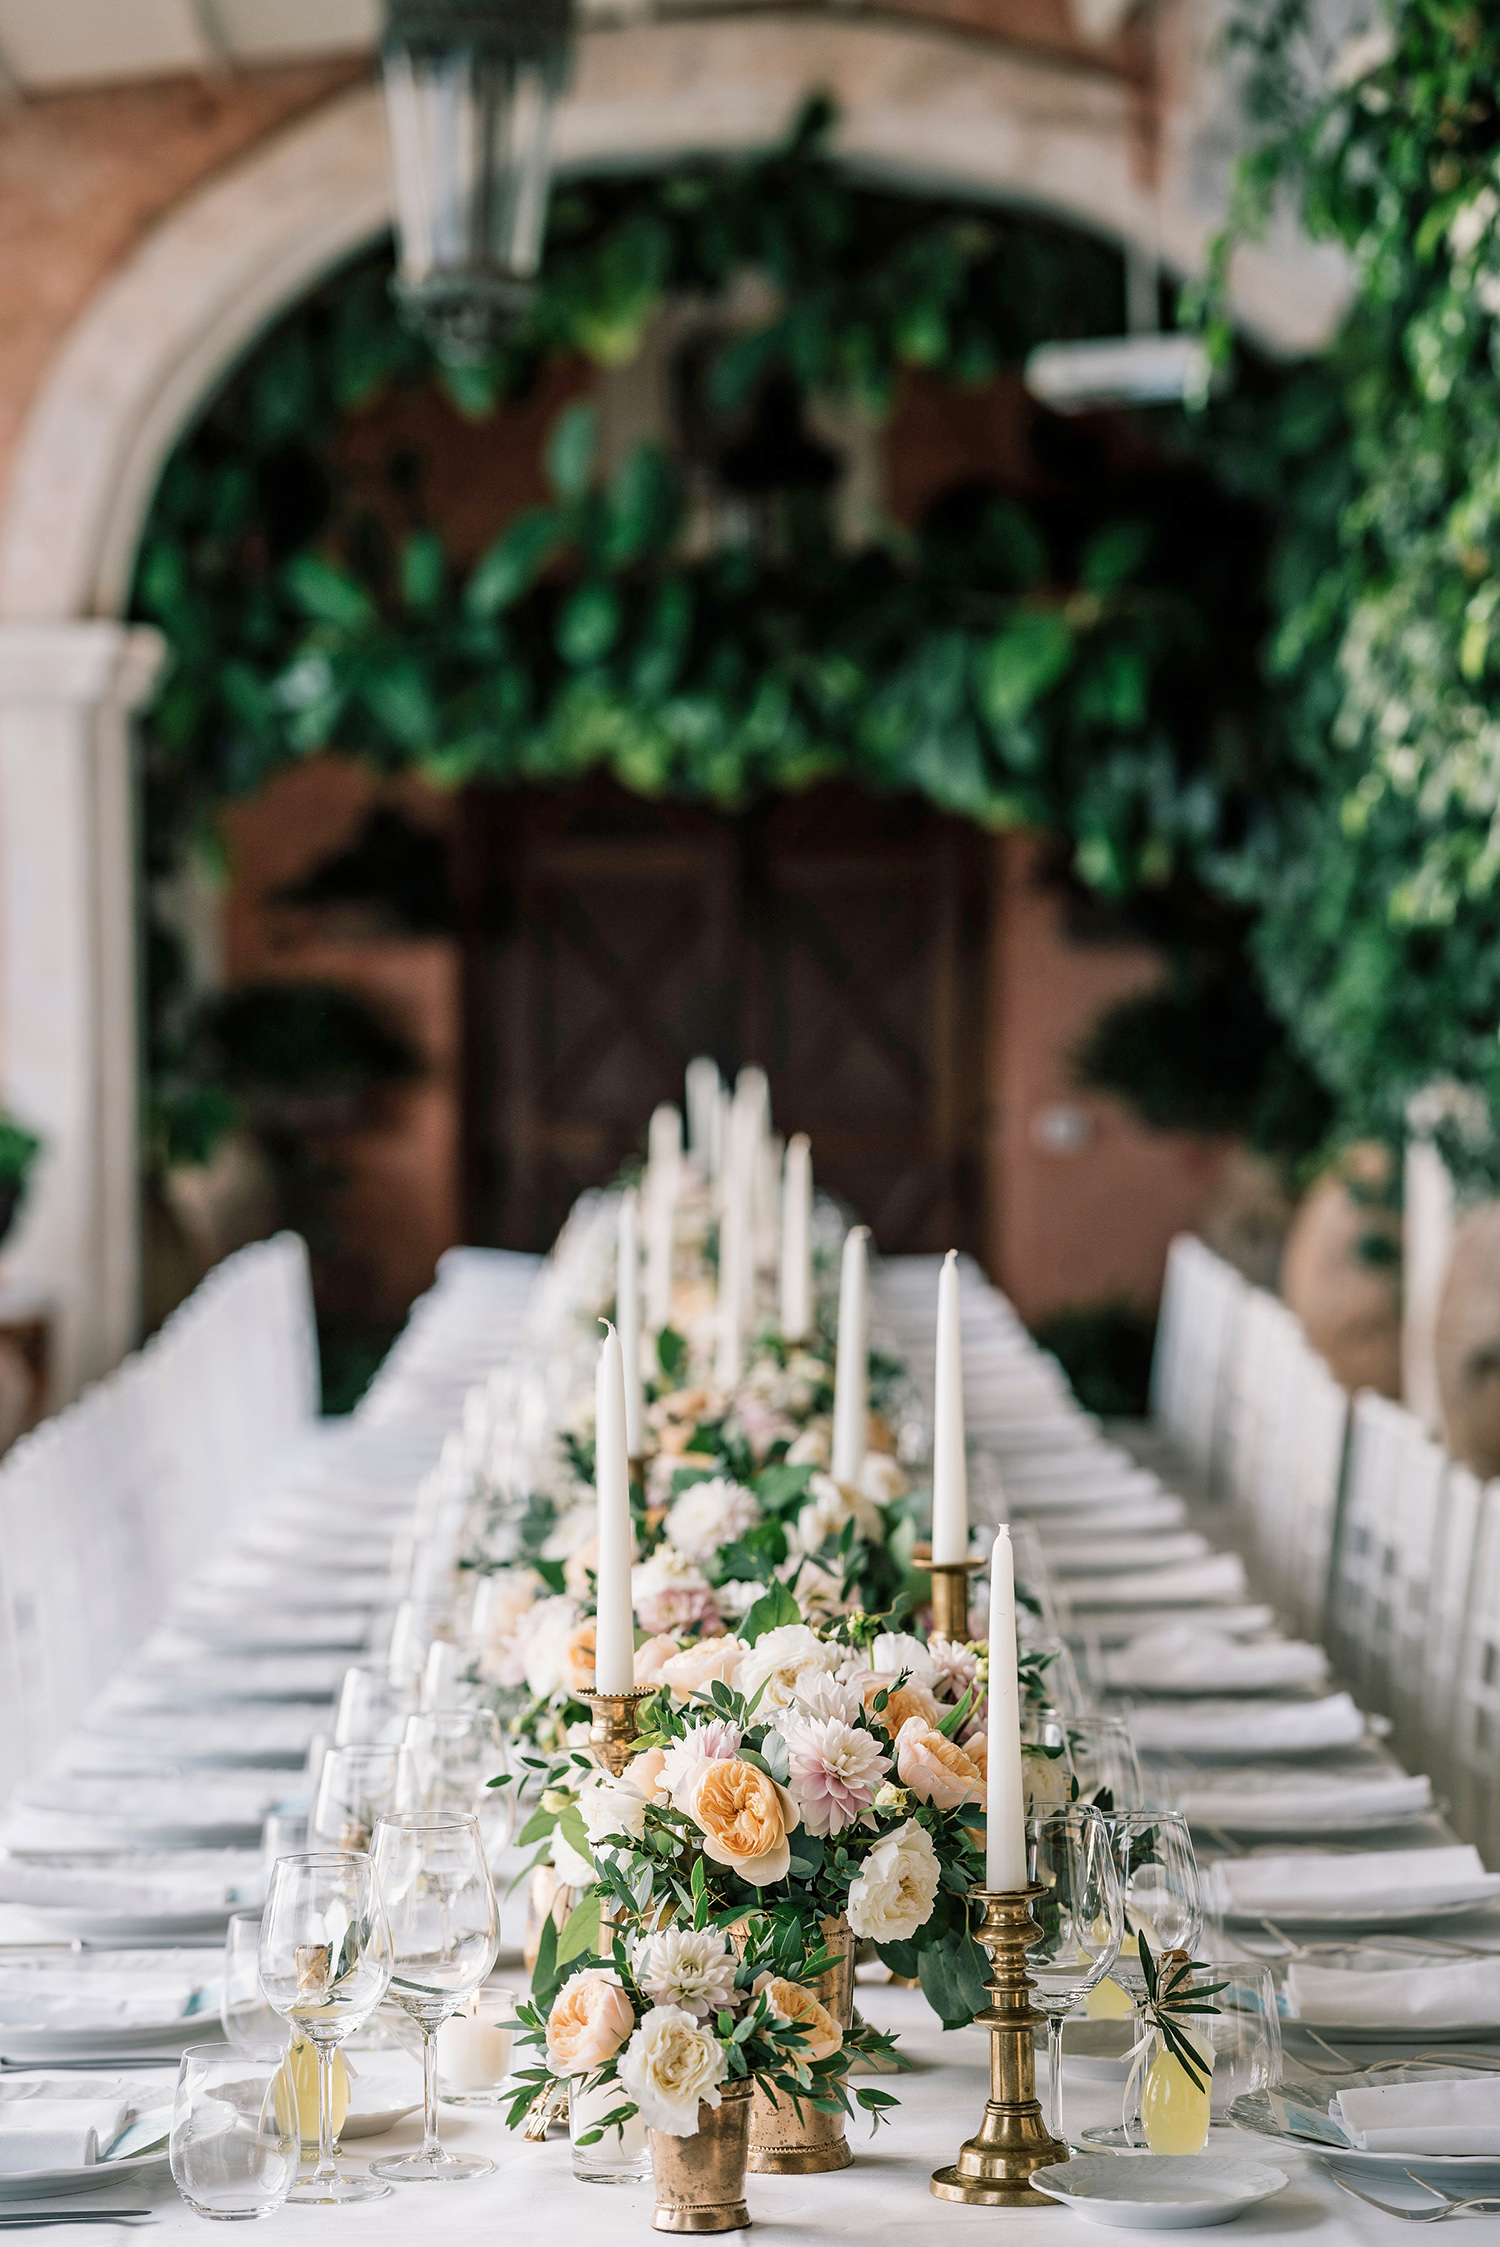 cara david wedding reception table setting